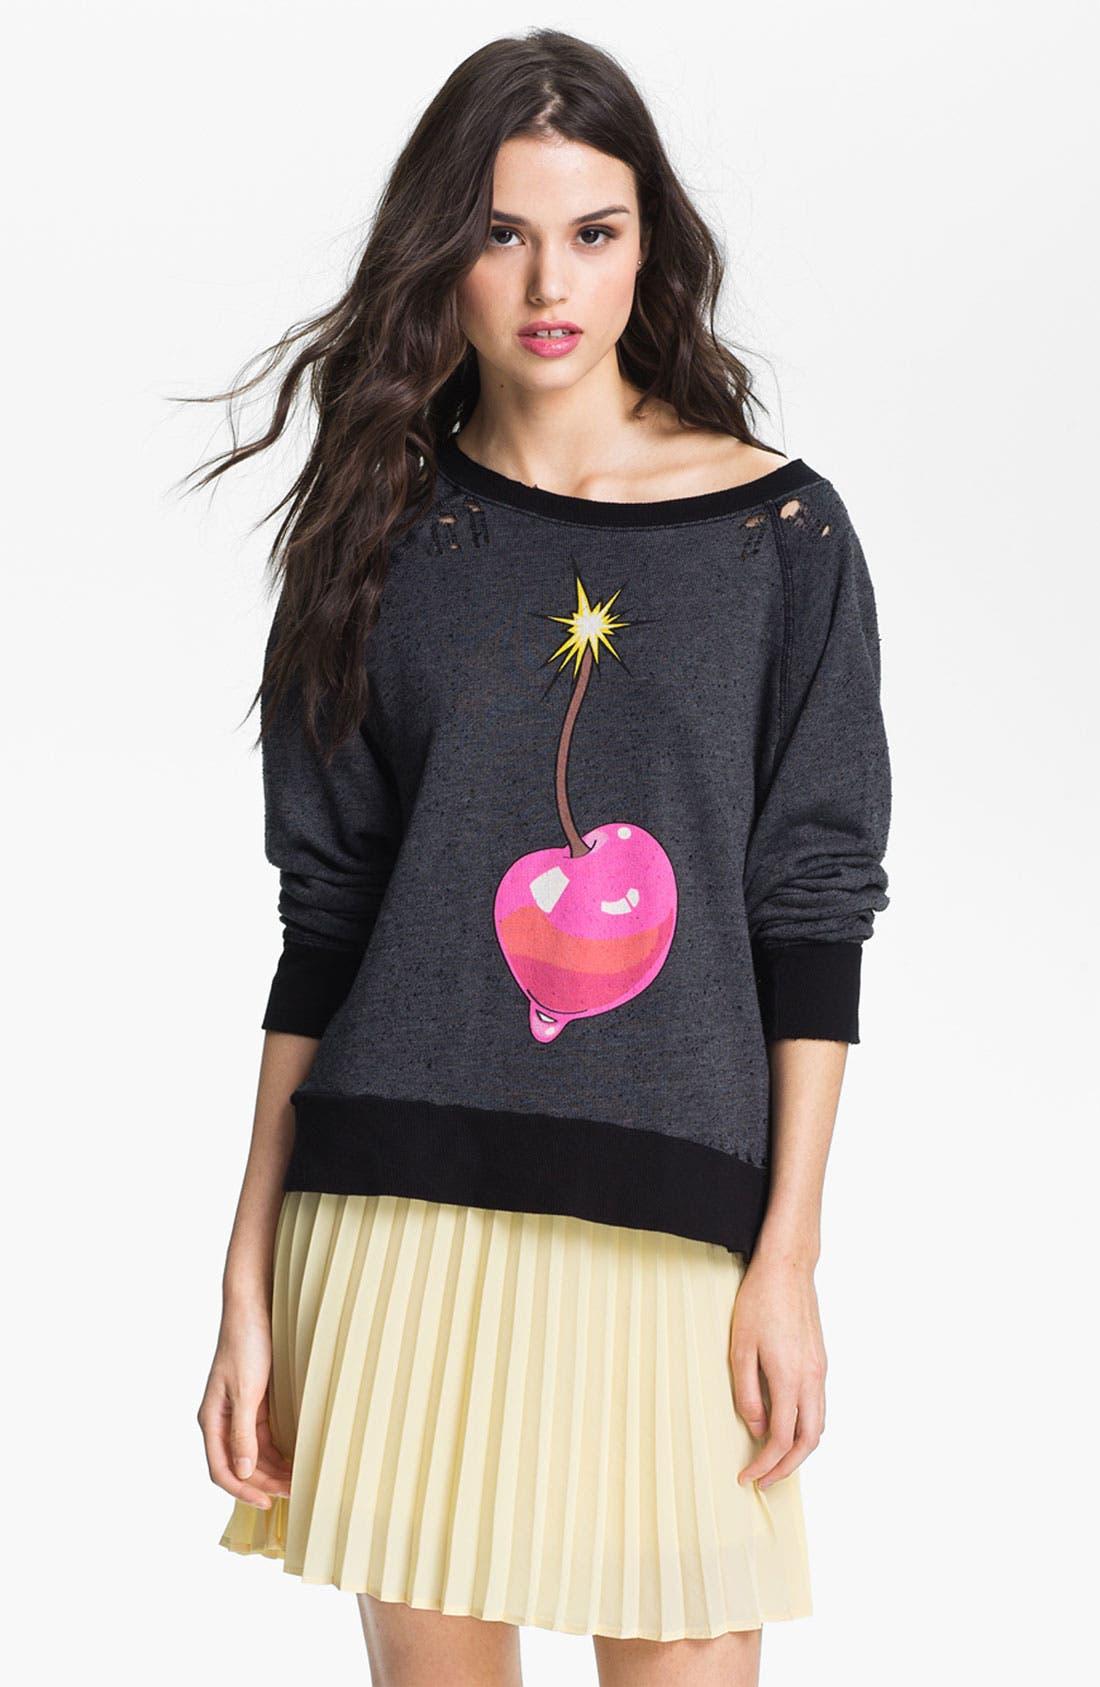 Main Image - Wildfox 'Cherry Bomb' Destroyed Sweatshirt (Nordstrom Exclusive)